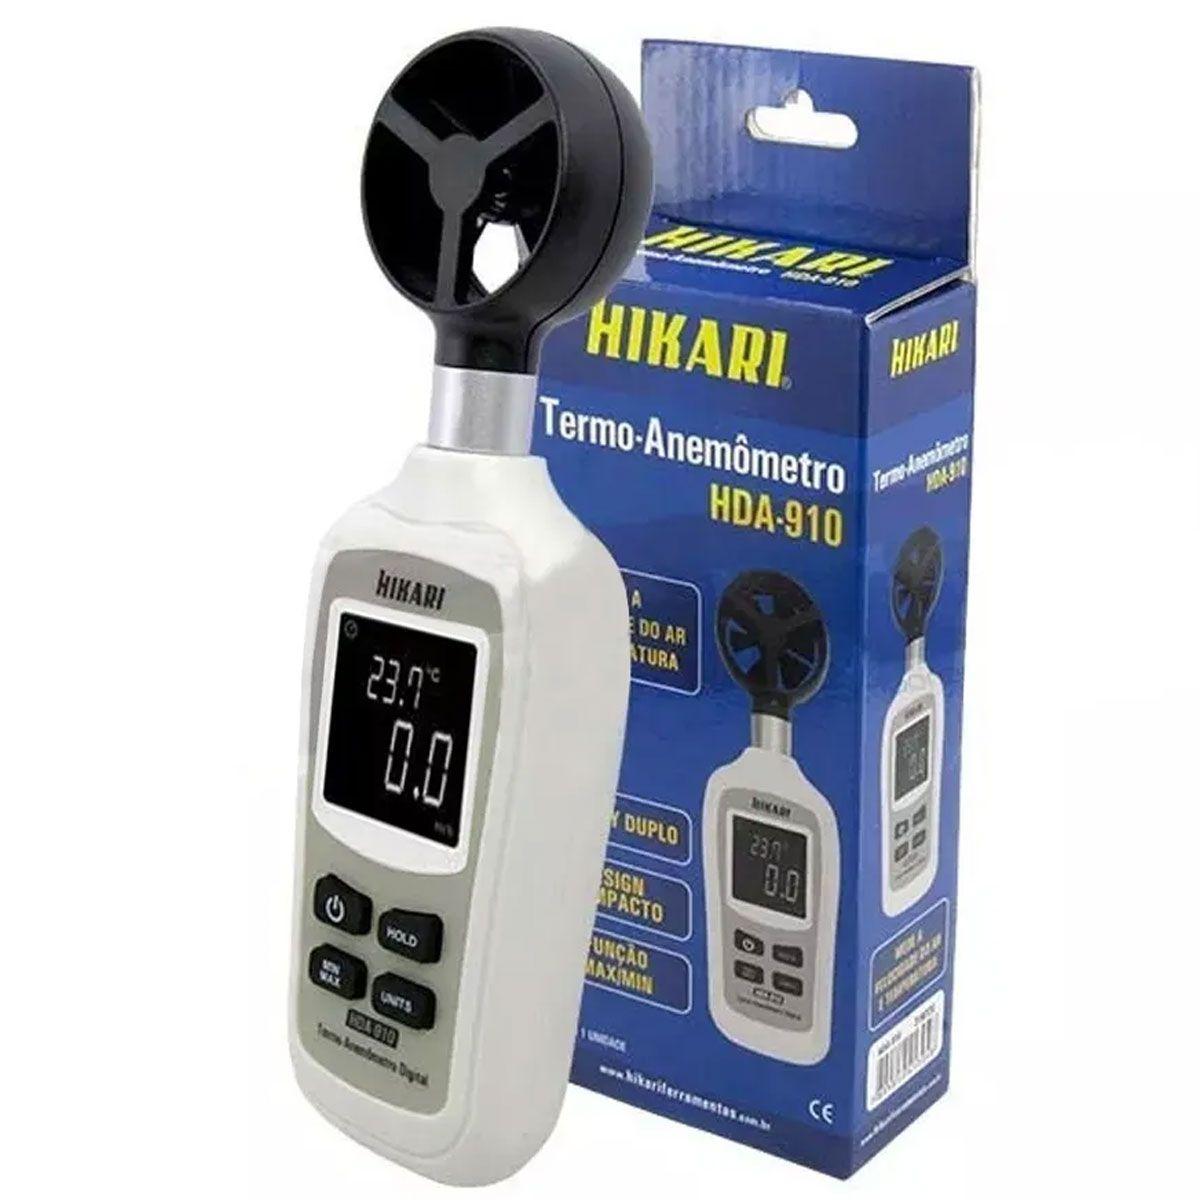 Mini Termo Anemômetro (Velocidade do ar e Temperatura) de -20°C a 60°C HDA-910 - HIKARI-21N220